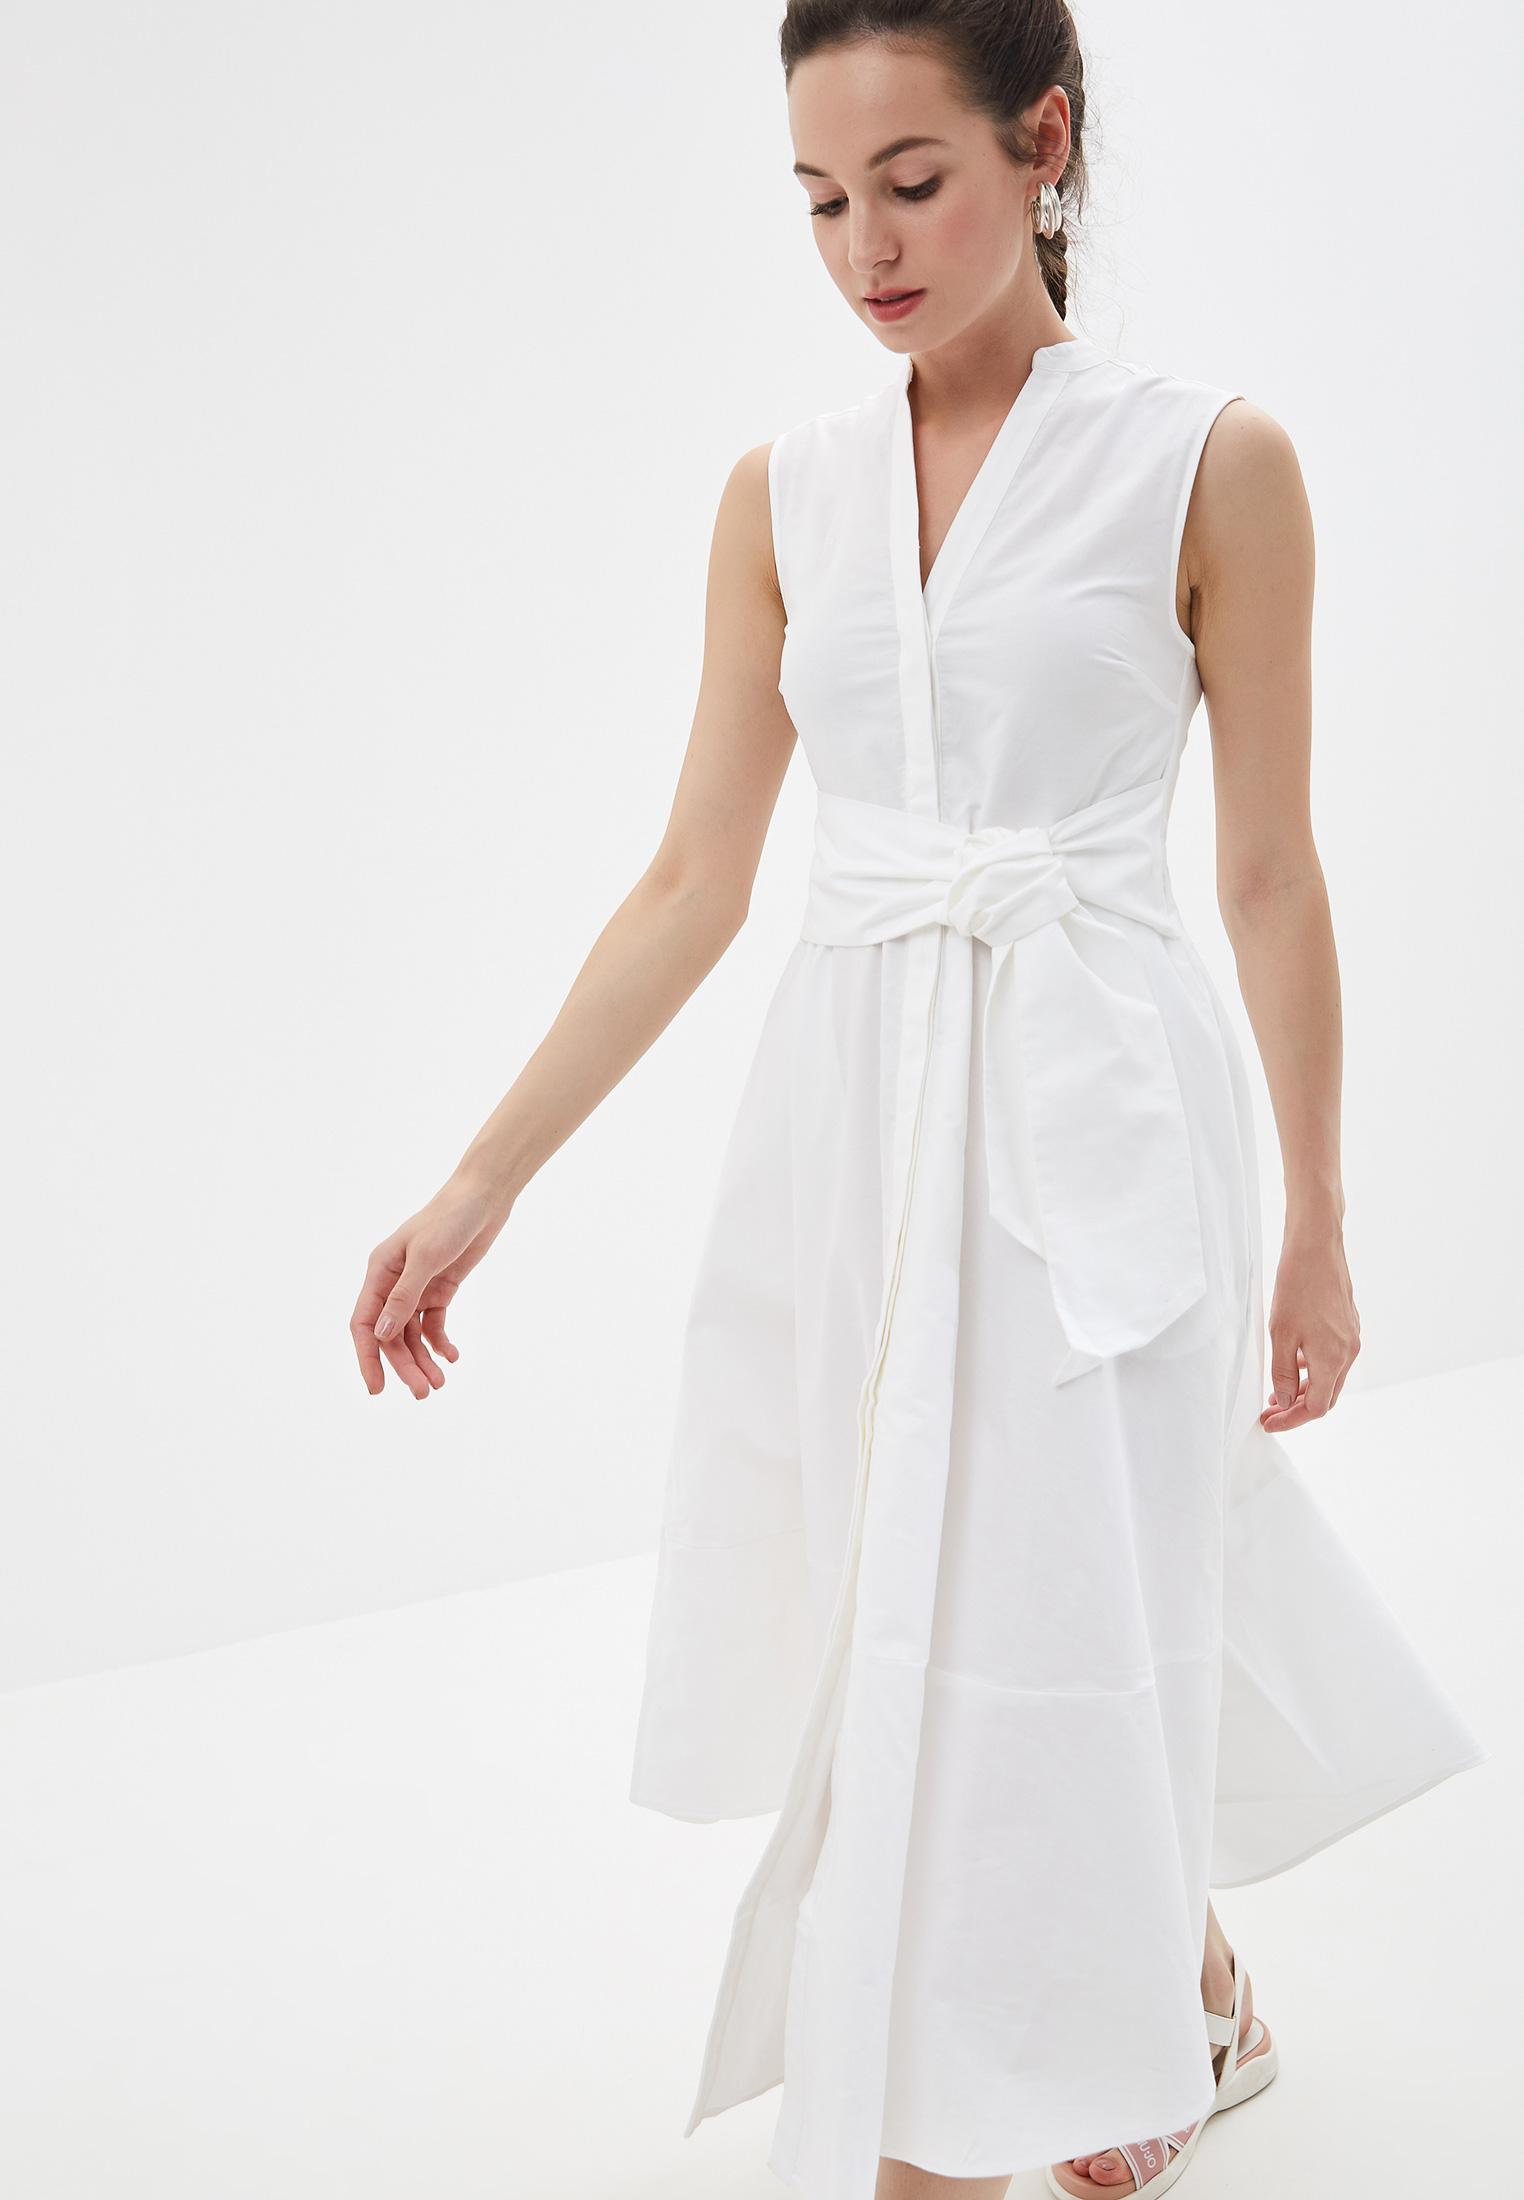 Платье Tommy Hilfiger (Томми Хилфигер) WW0WW25458